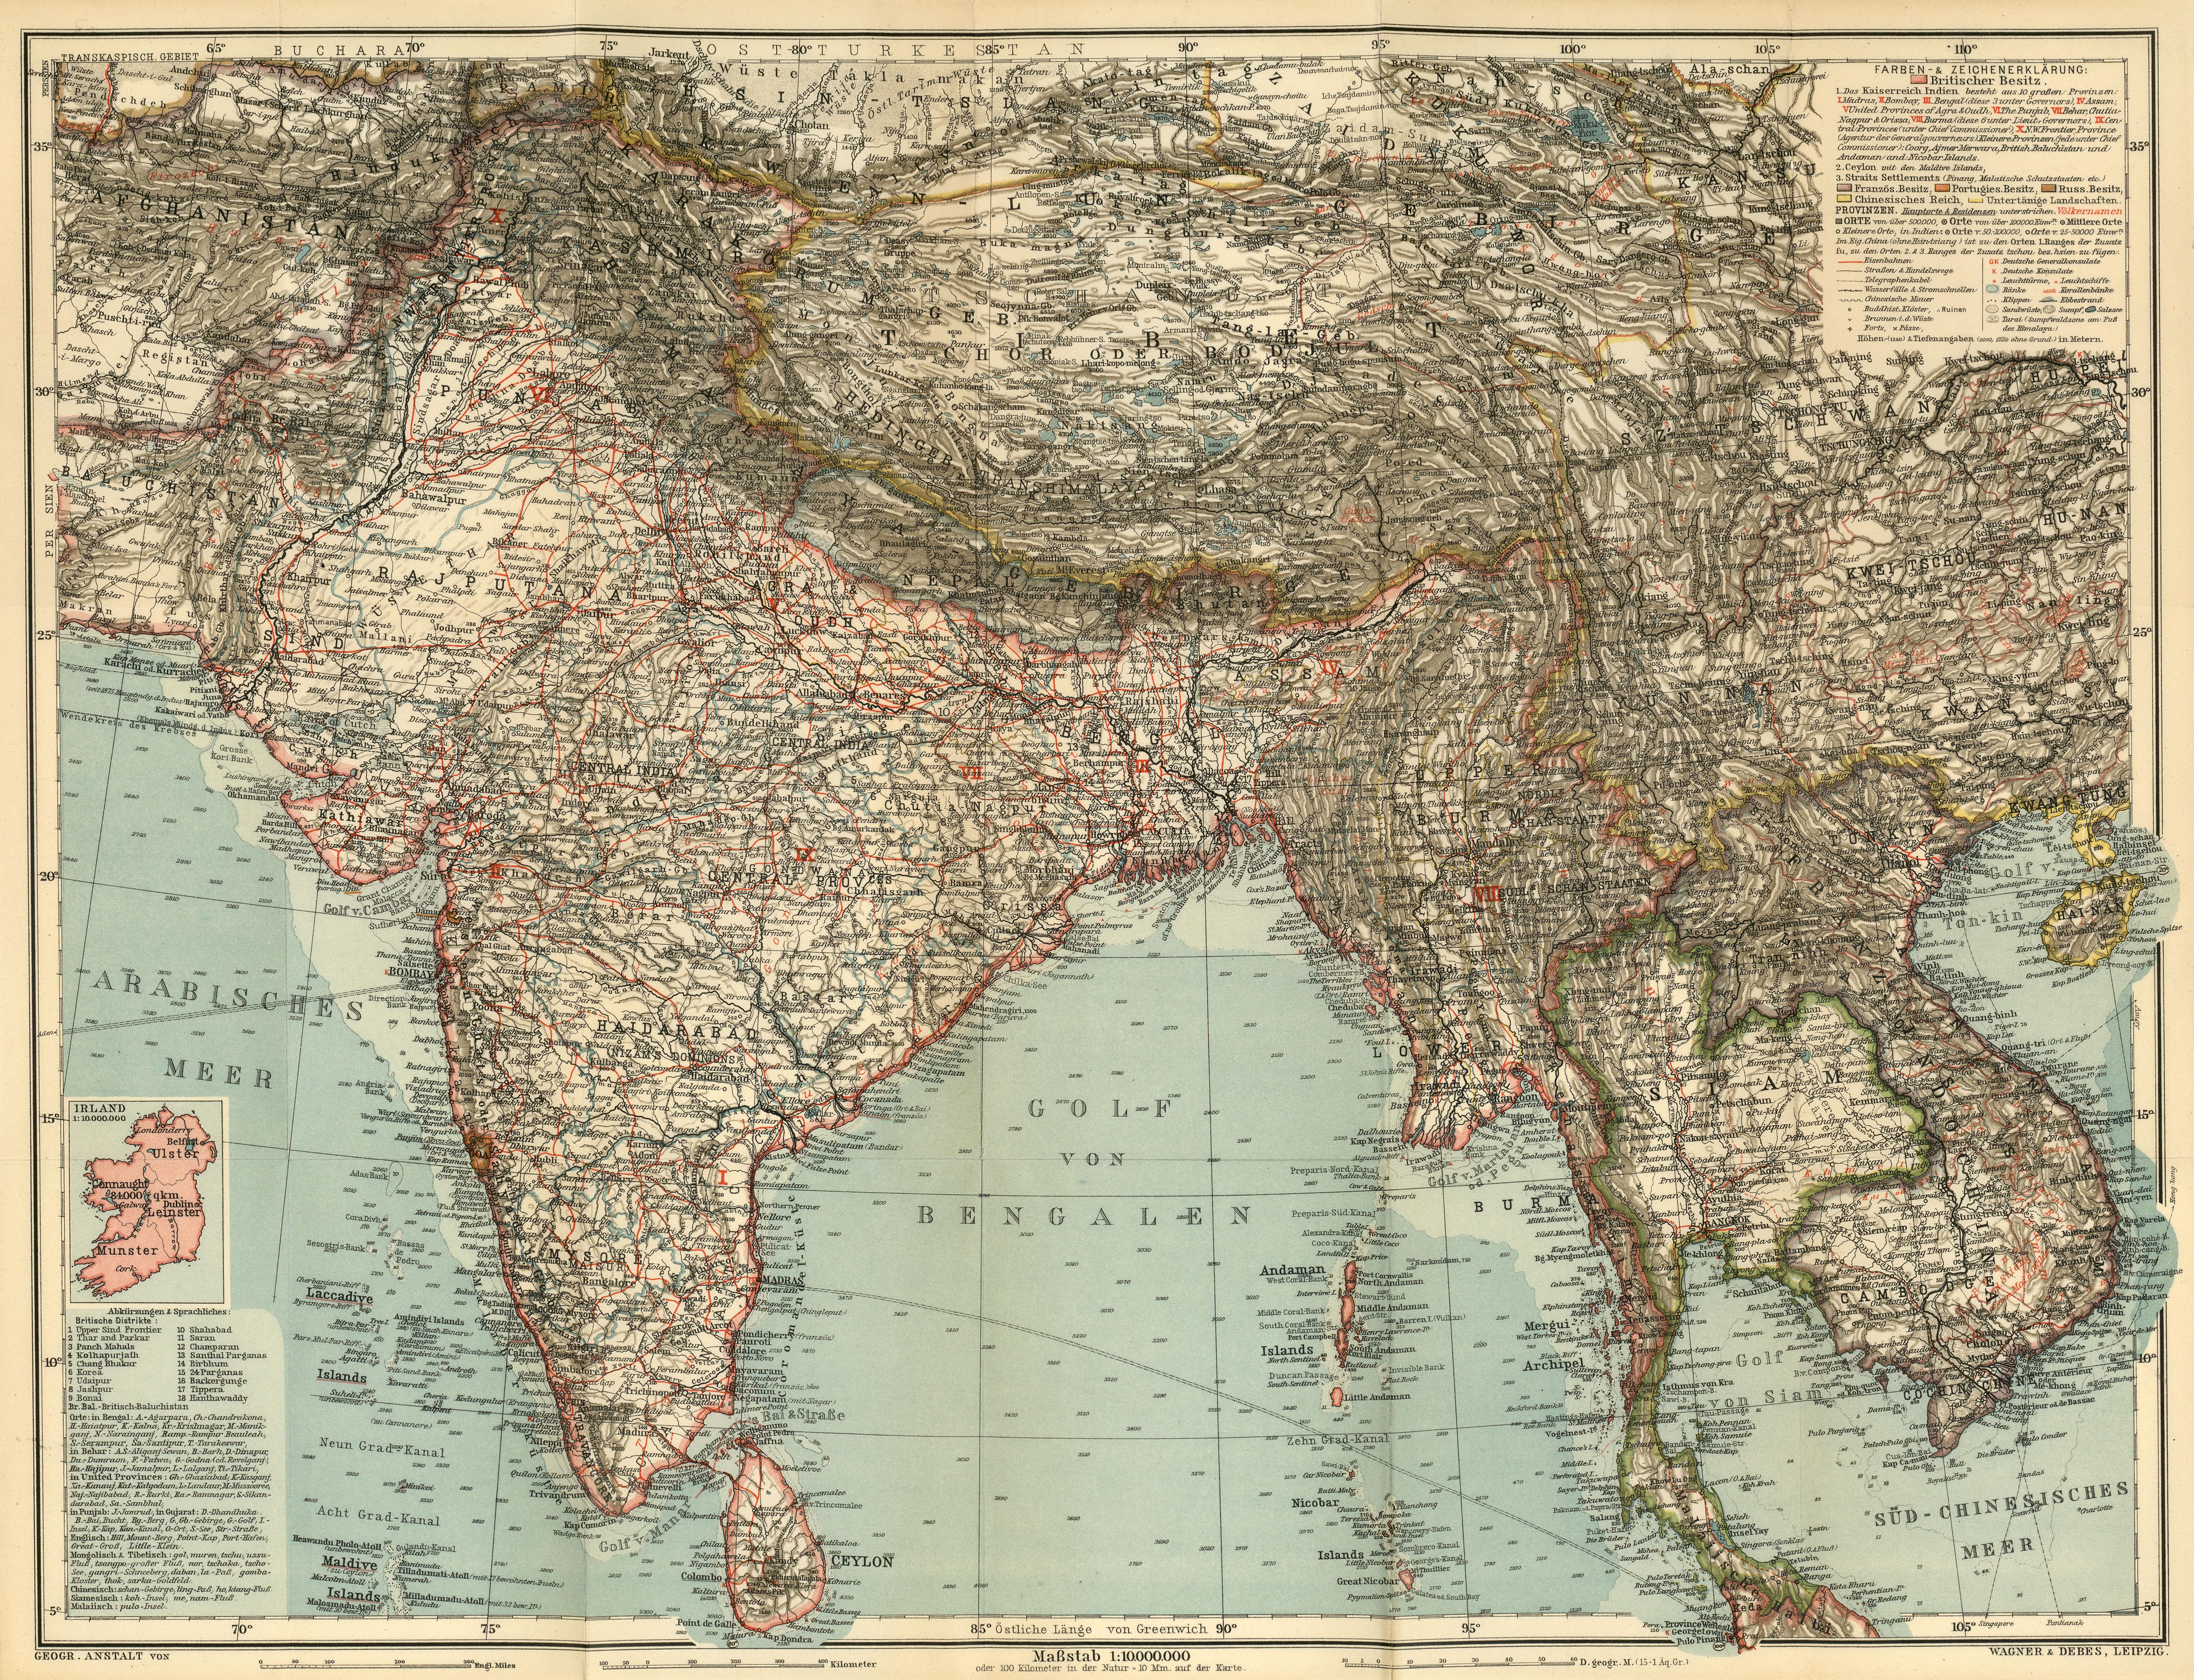 http://www.lib.utexas.edu/maps/historical/baedeker_indien_1914/txu-pclmaps-south_asia_1914.jpg